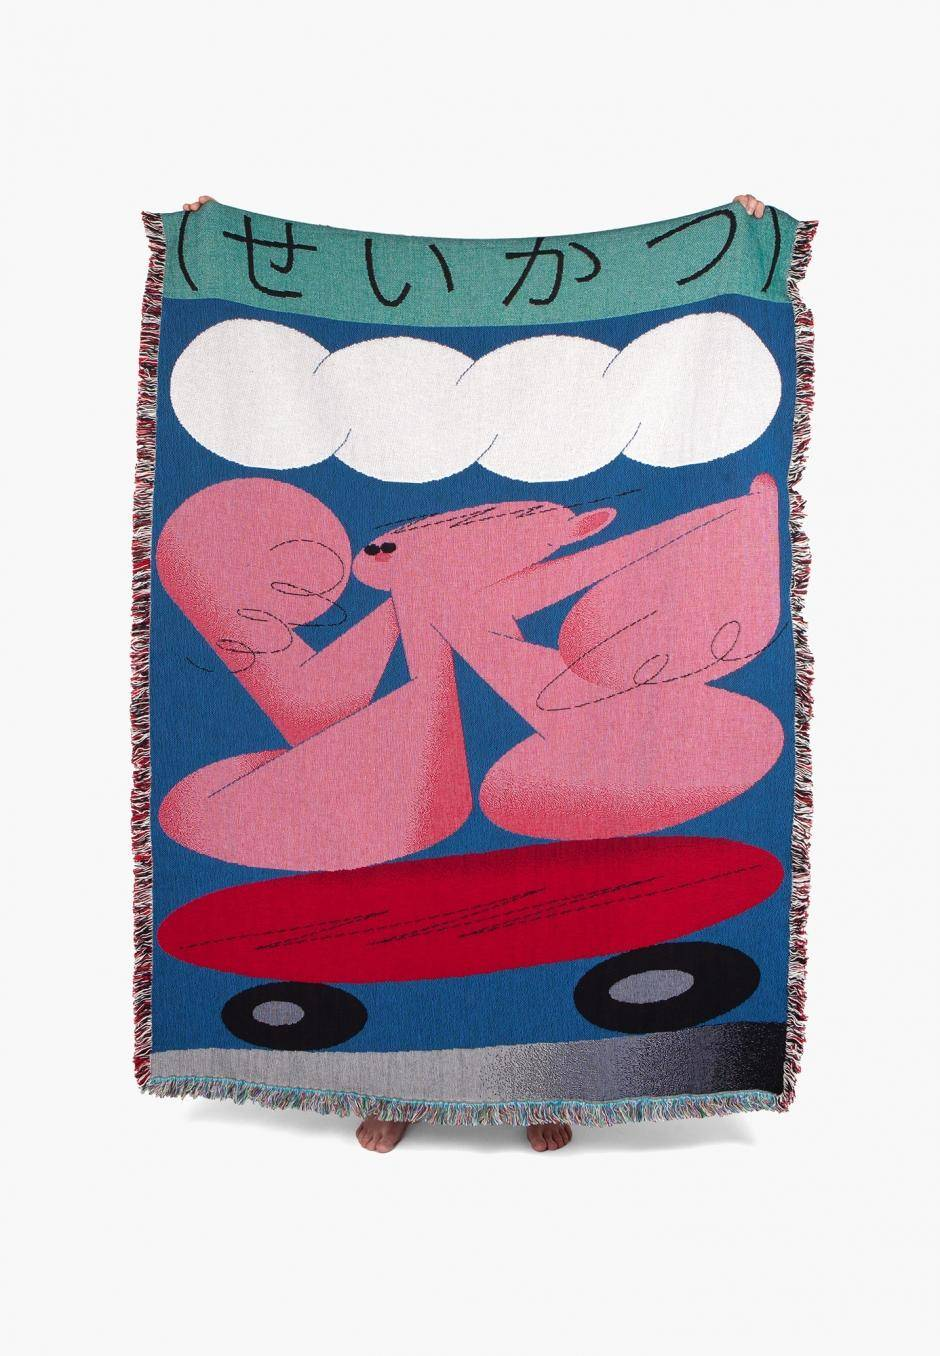 Slowdown Studio Suzuki Throw - Shun Sasaki